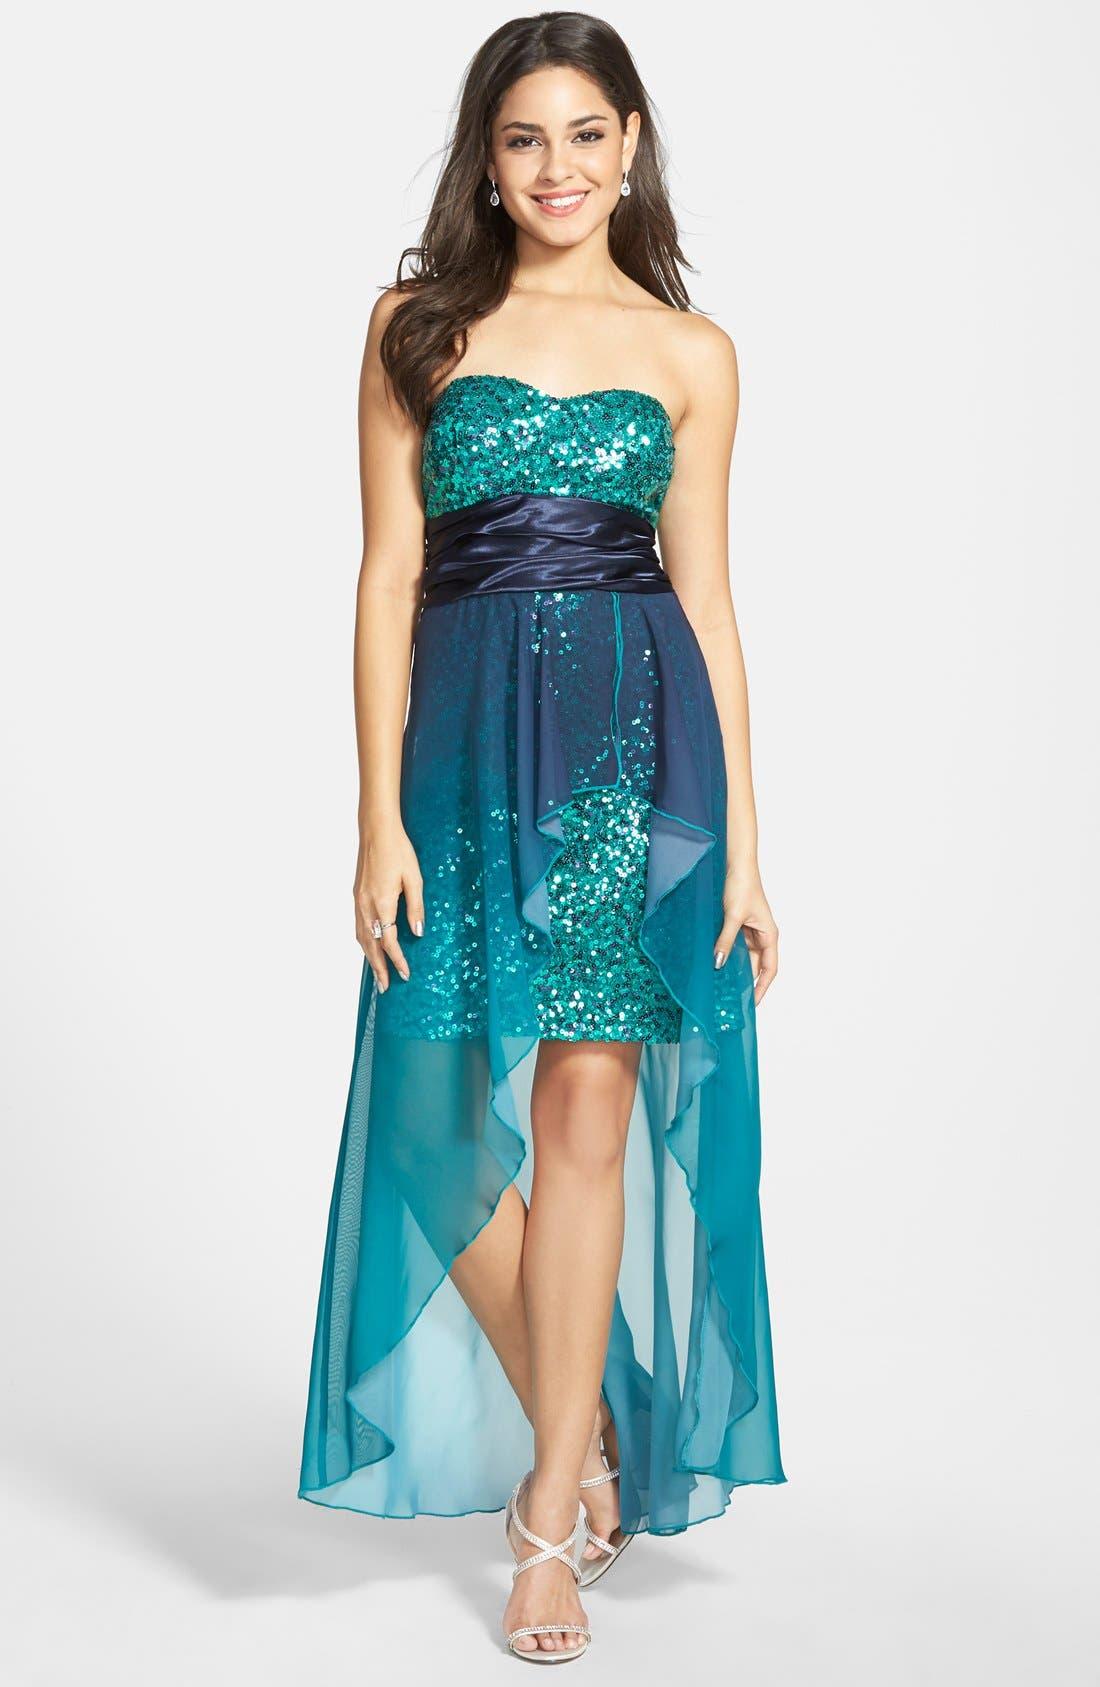 Unusual Juniors Party Dresses Cheap Gallery - Wedding Ideas ...